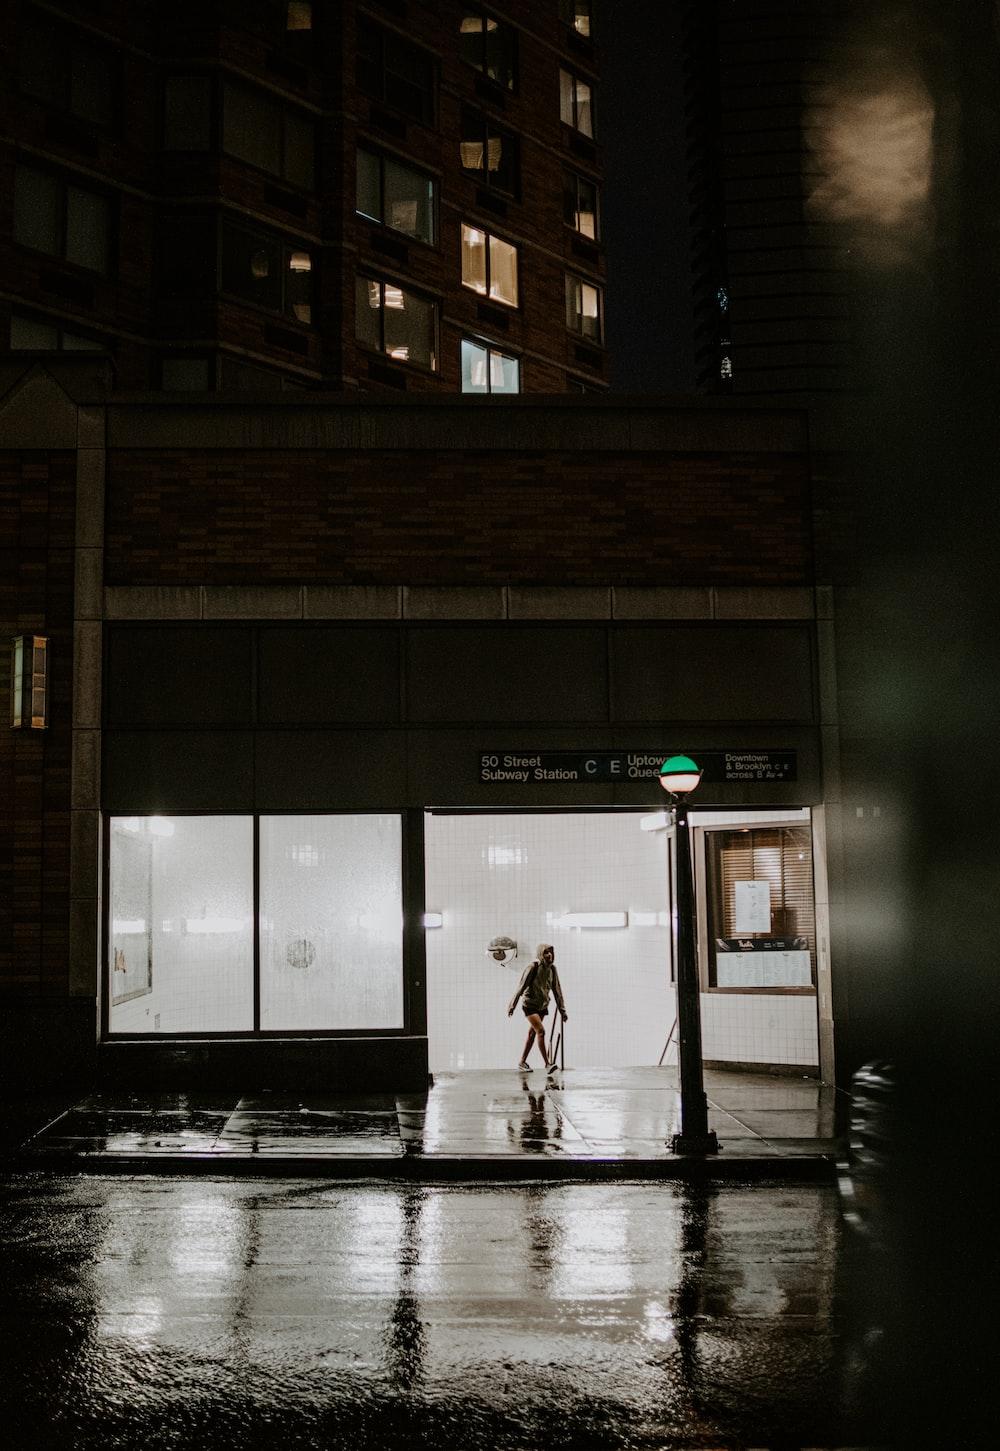 person walking on sidewalk during night time